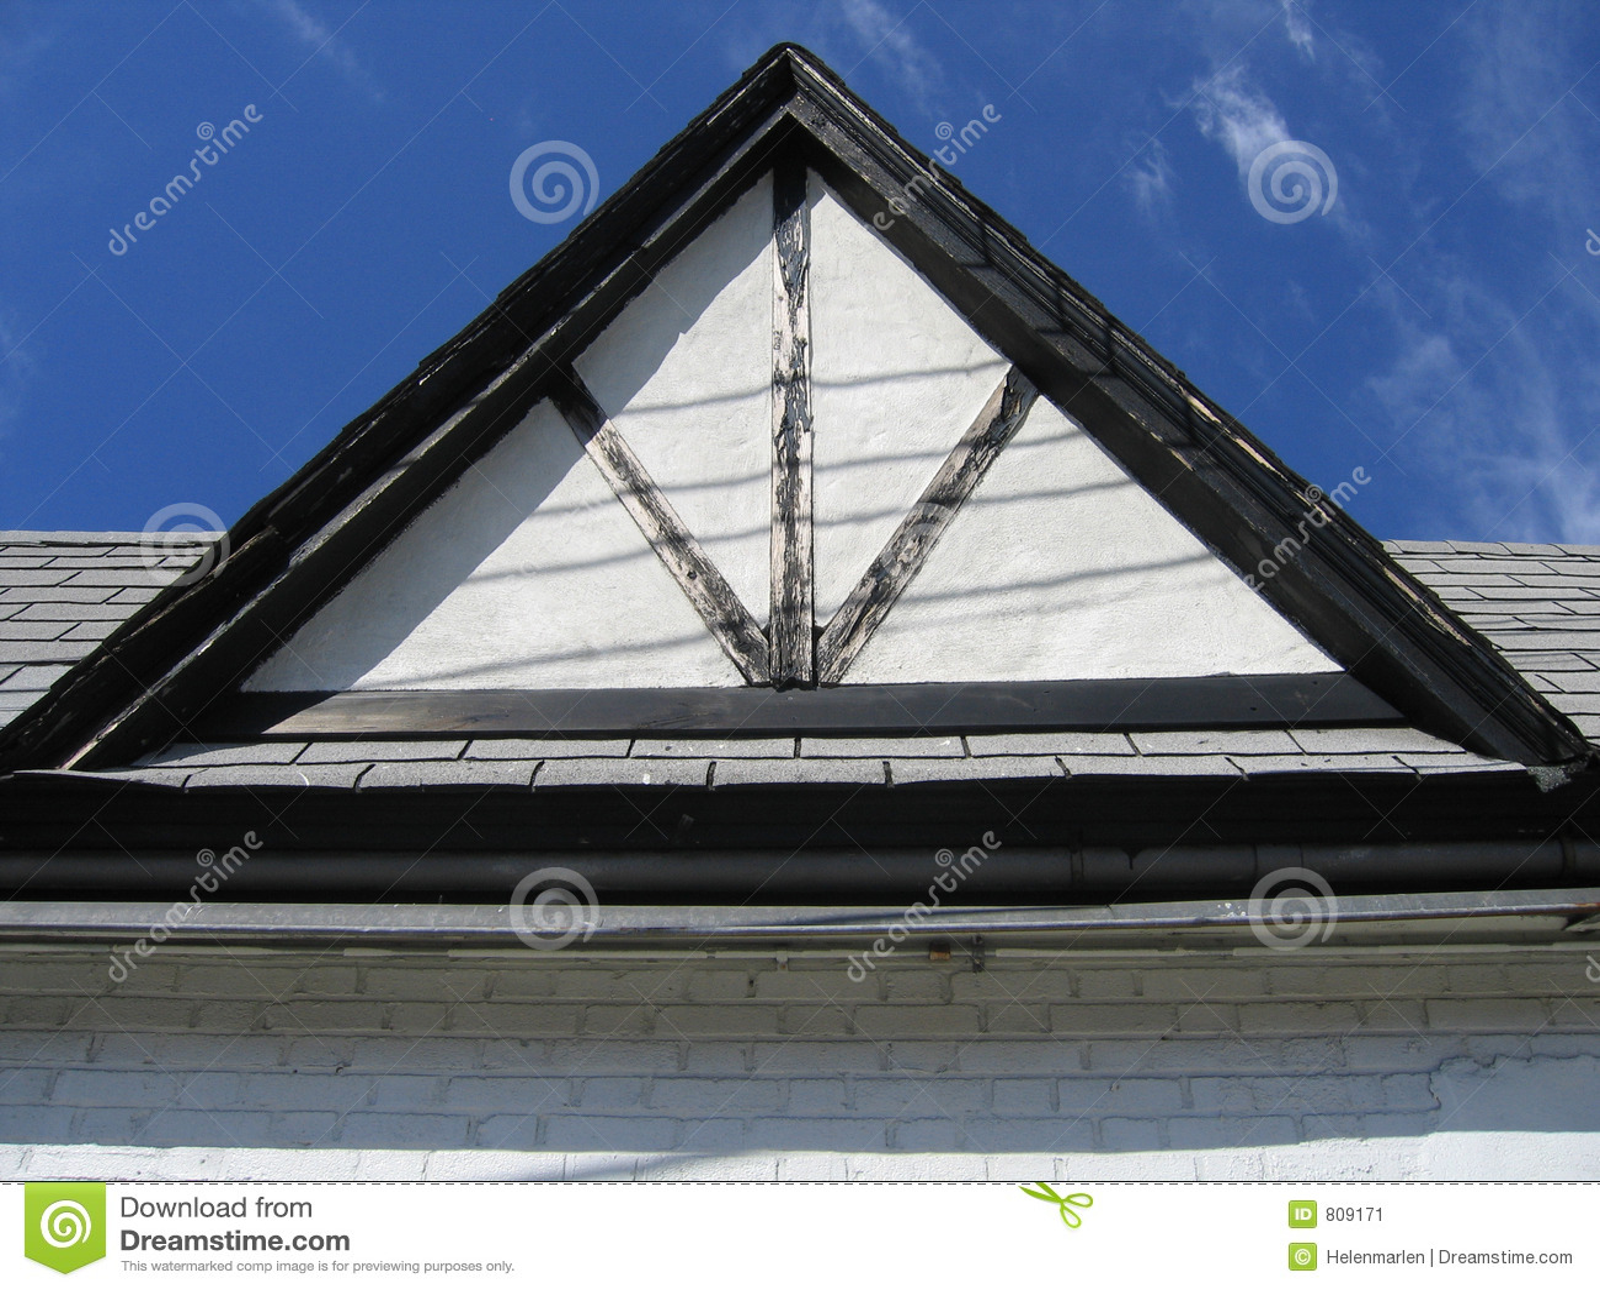 Toit triangulaire image stock image du architecture for Architecture triangulaire